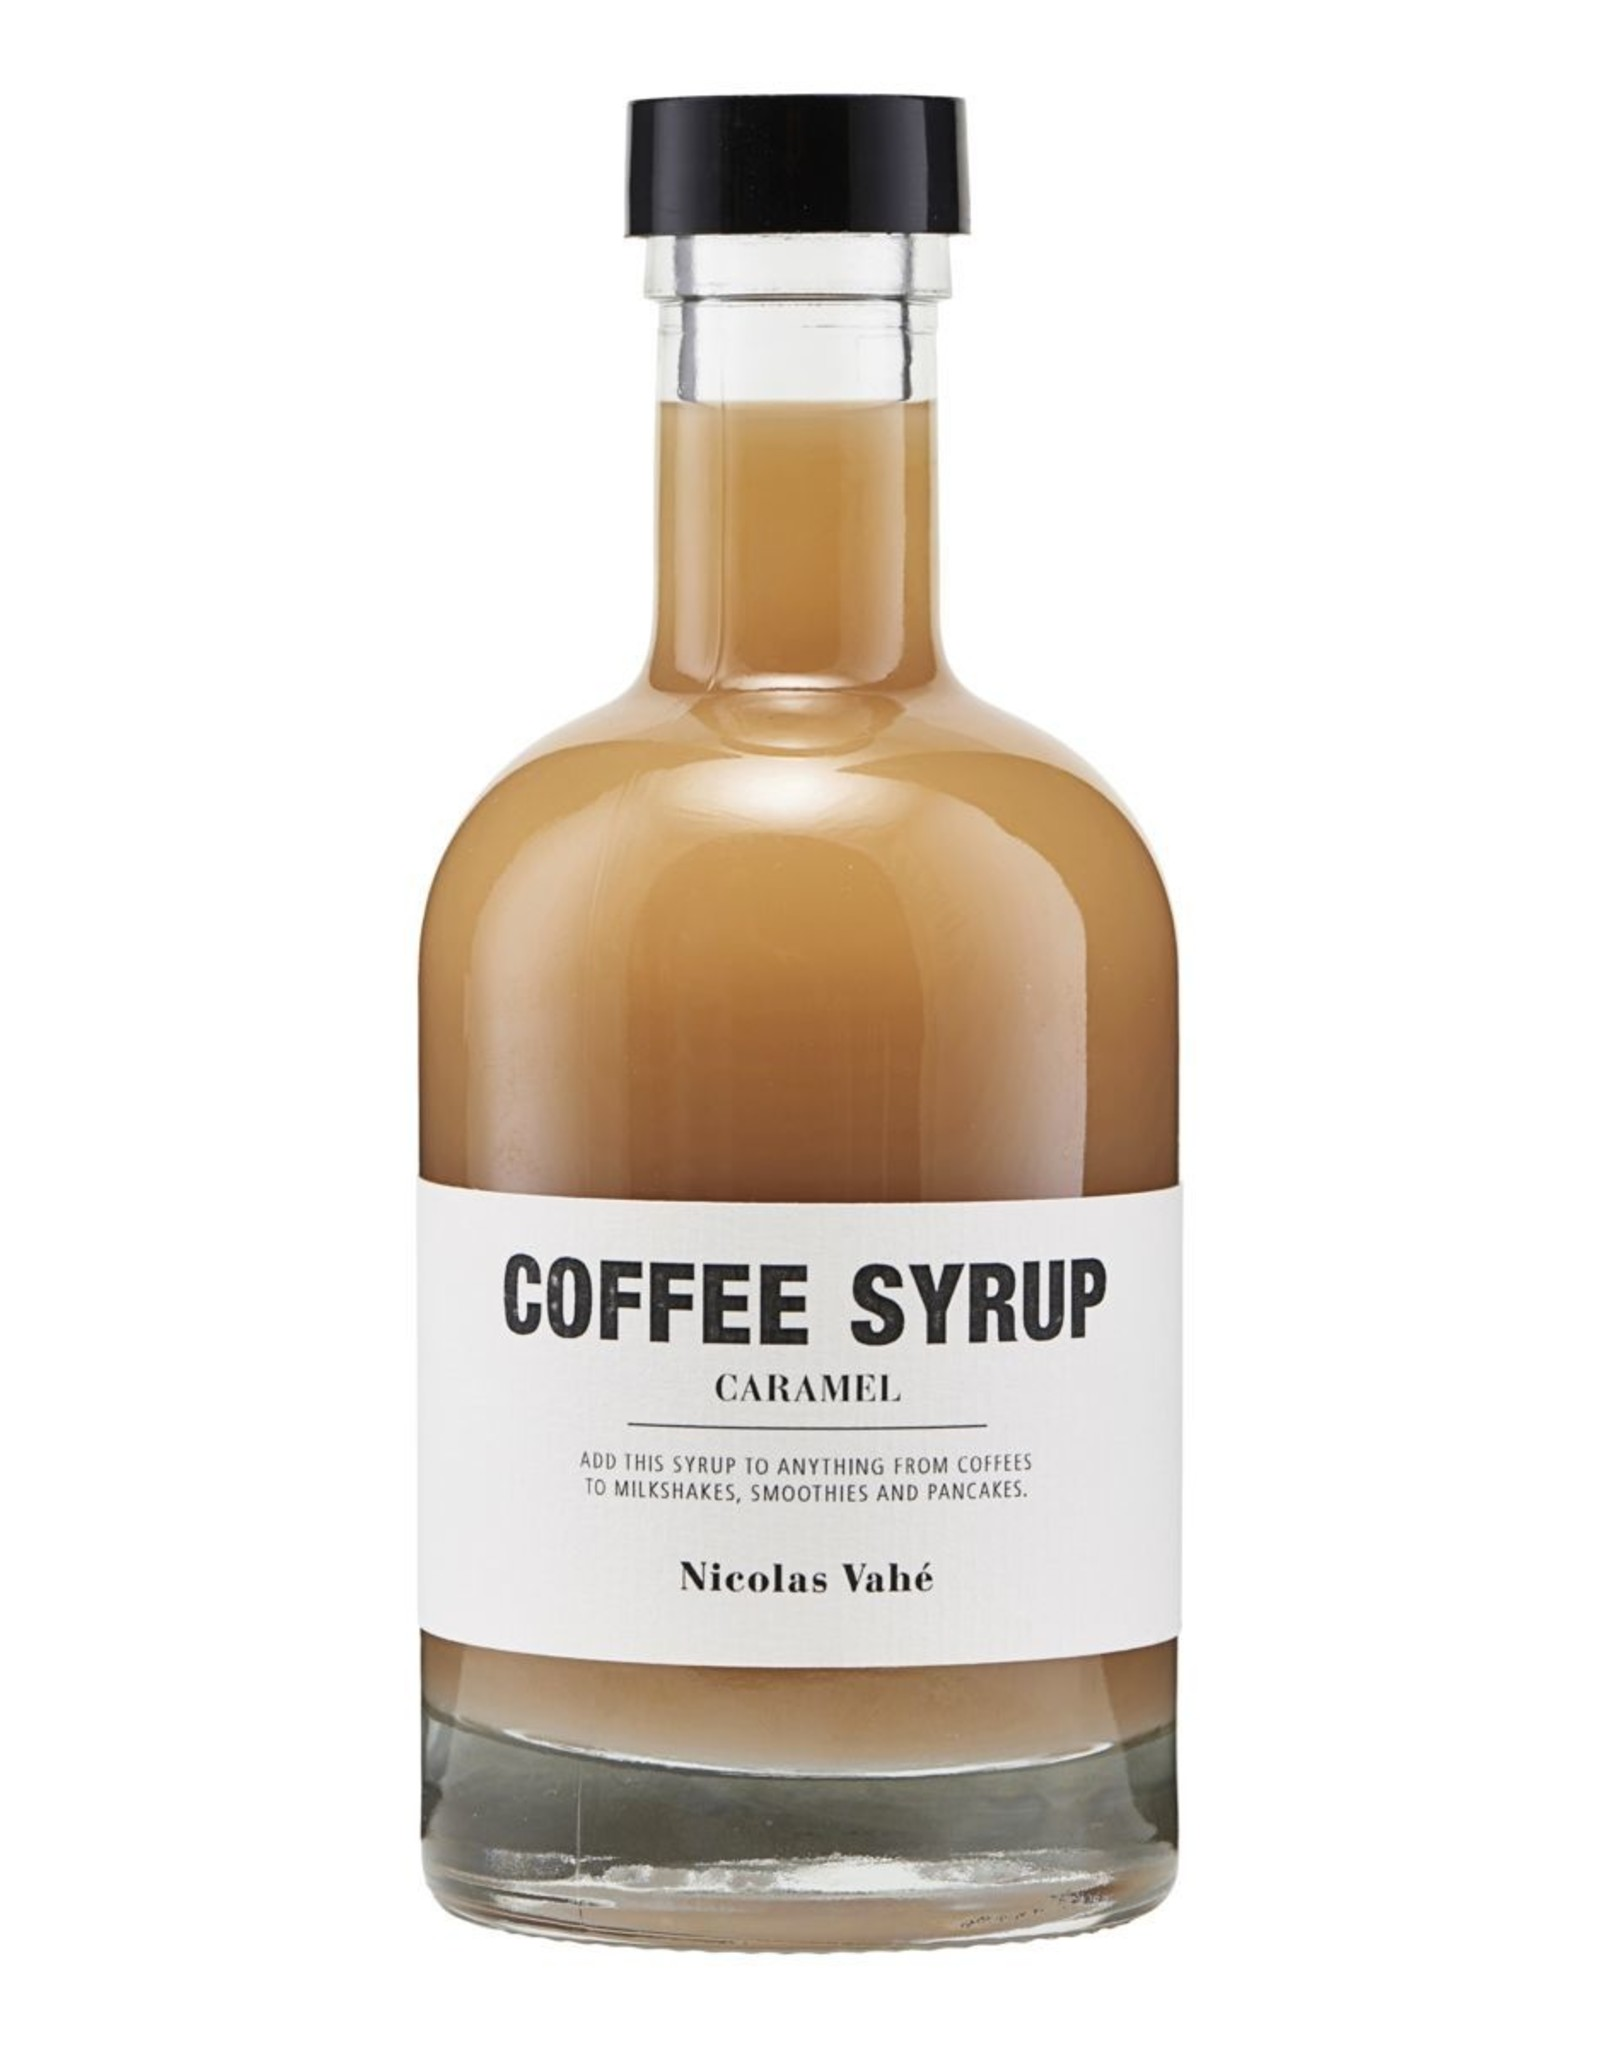 Nicolas Vahé Nicolas Vahé Syrup Caramel